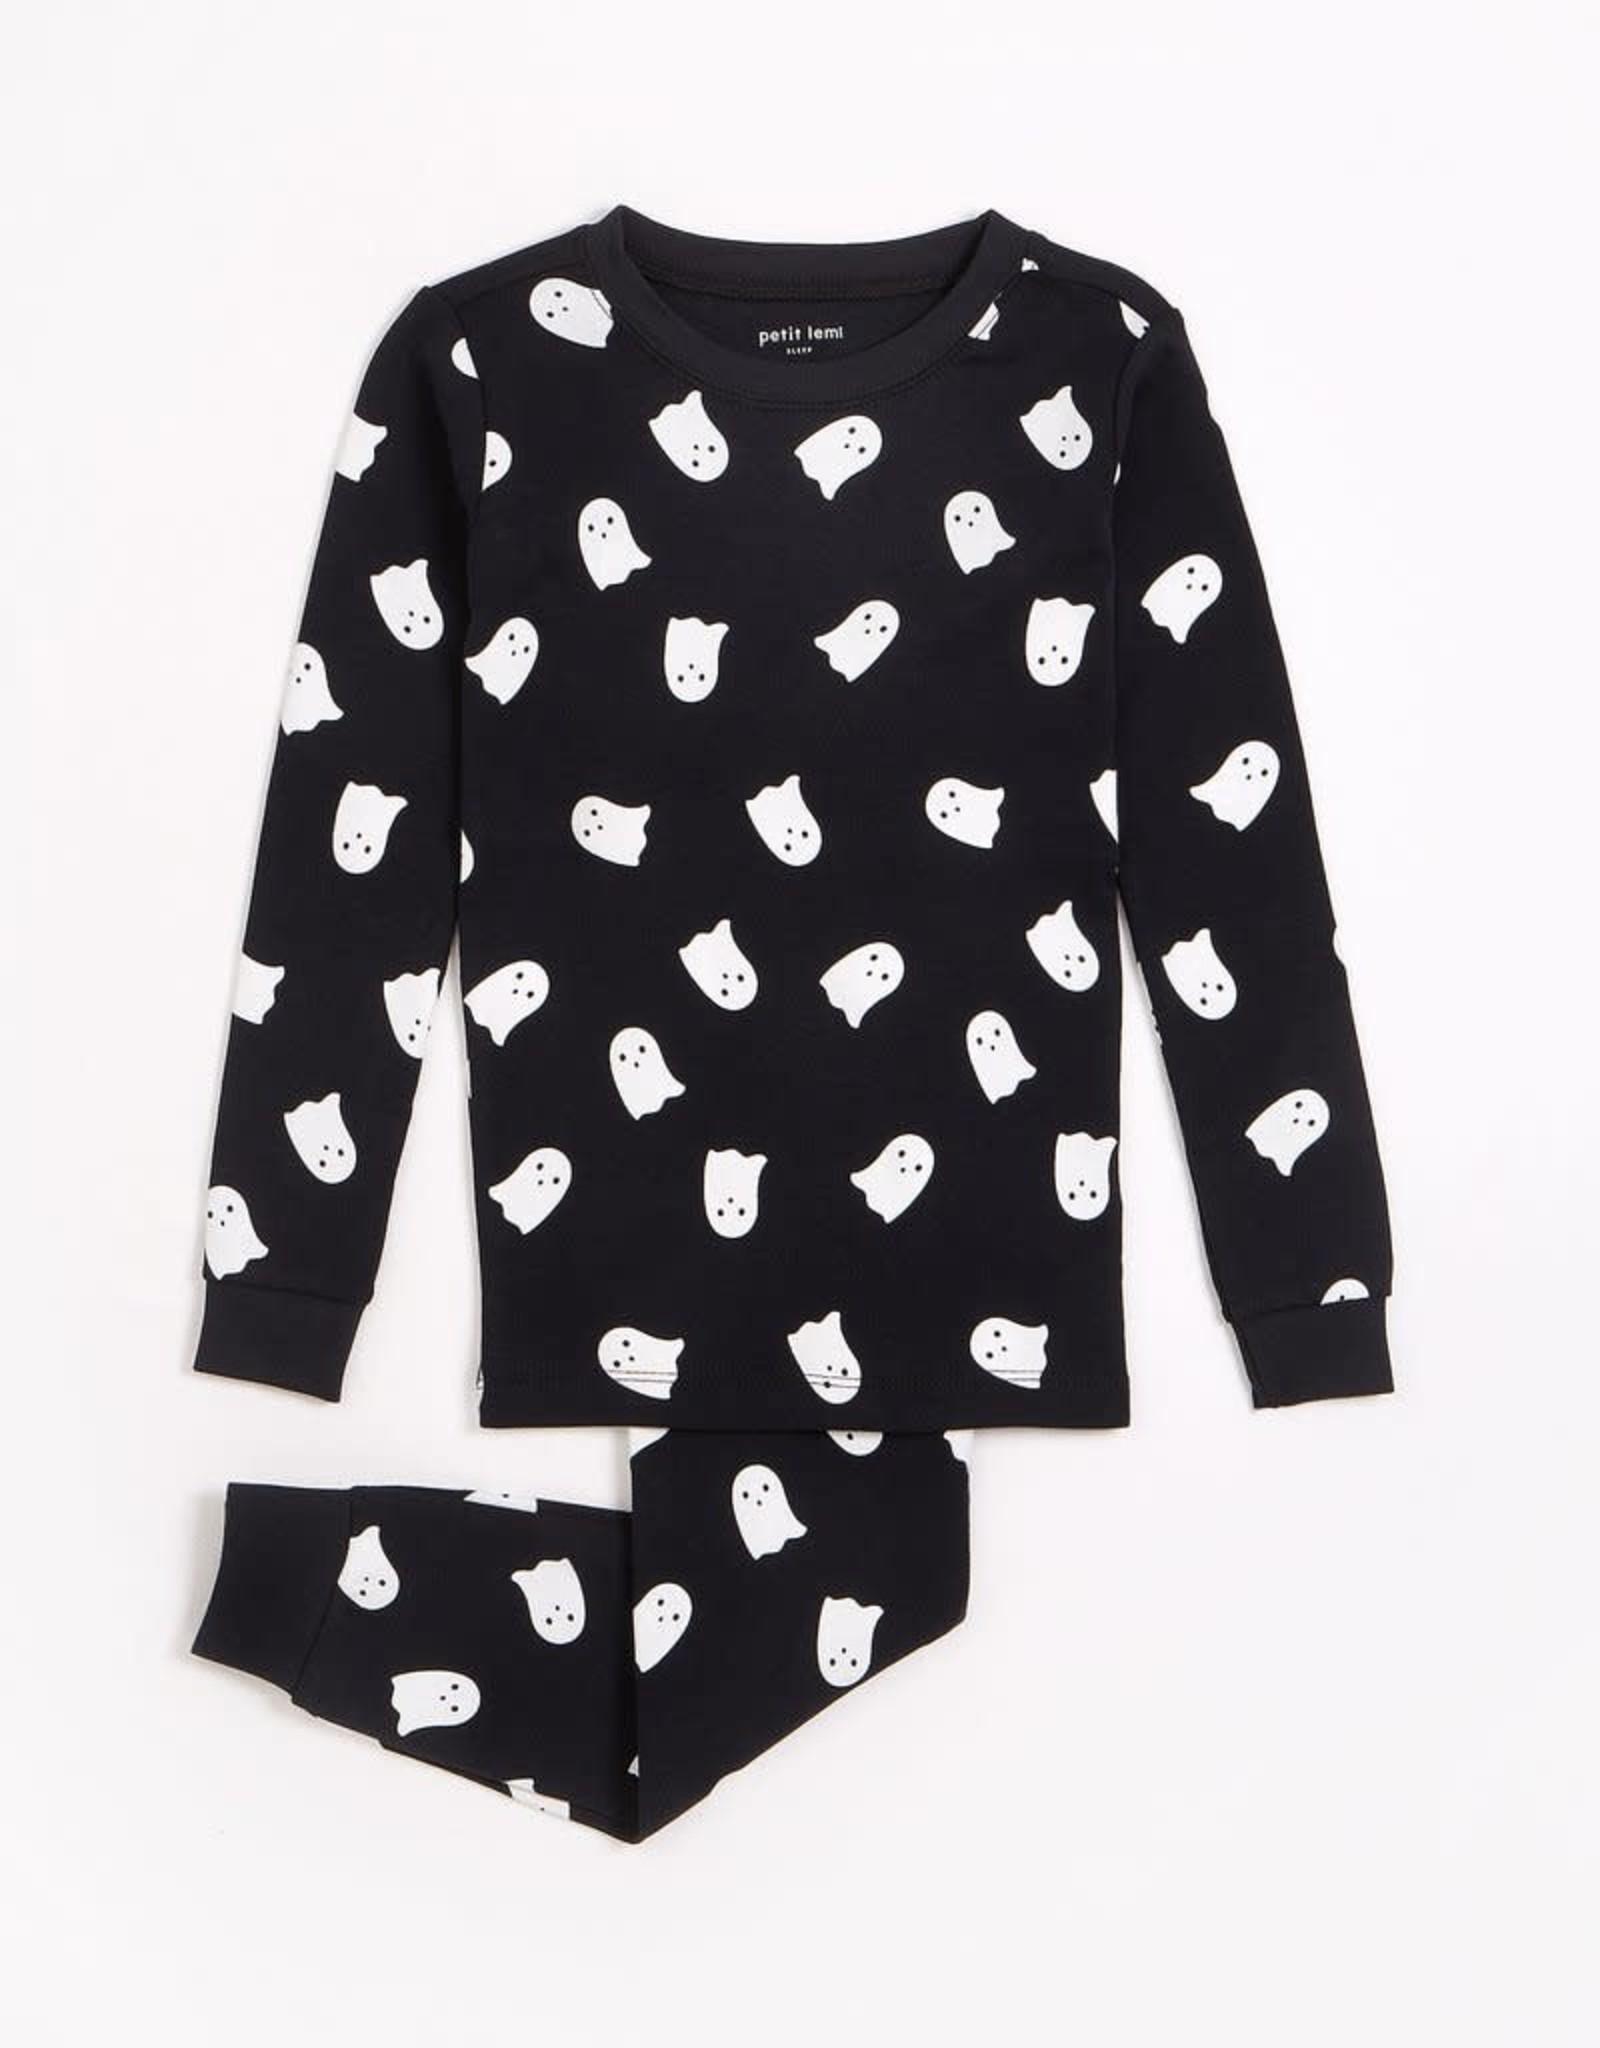 Petit Lem Petit Lem Toddler 2pc Pj Set L/S Top + Pants Black Ghosts